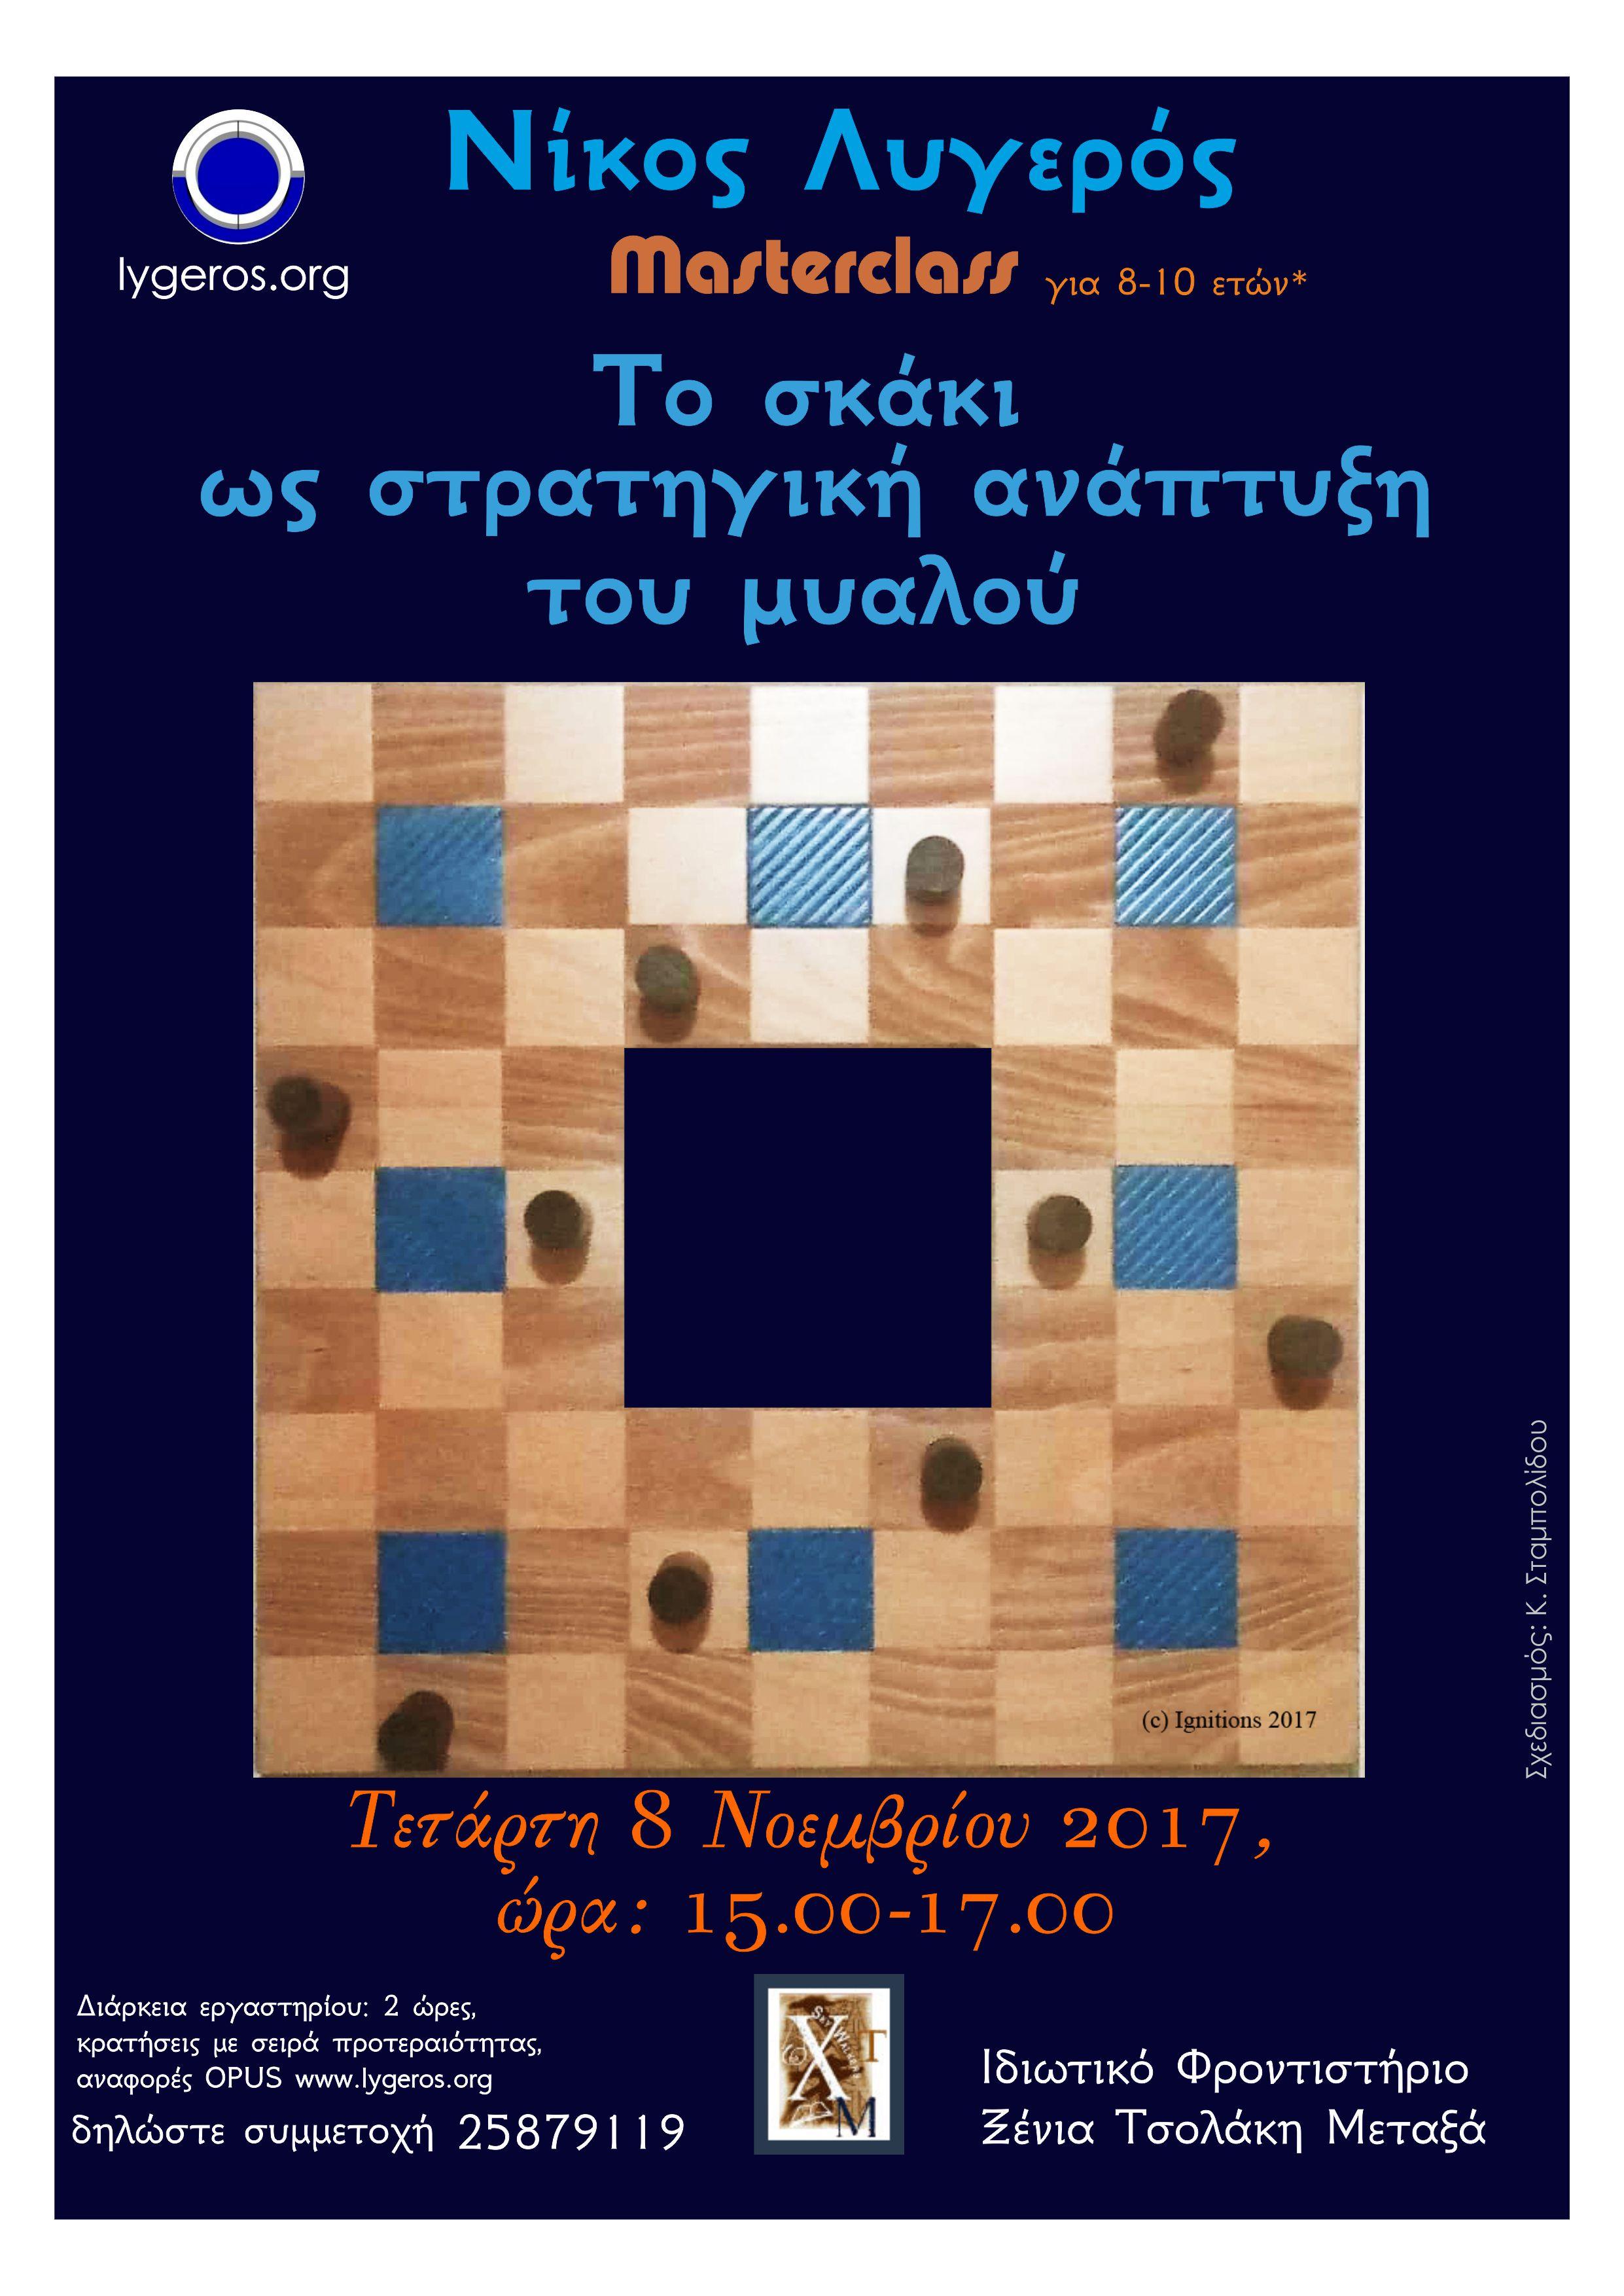 Masterclass: Το σκάκι ως στρατηγική ανάπτυξη του μυαλού